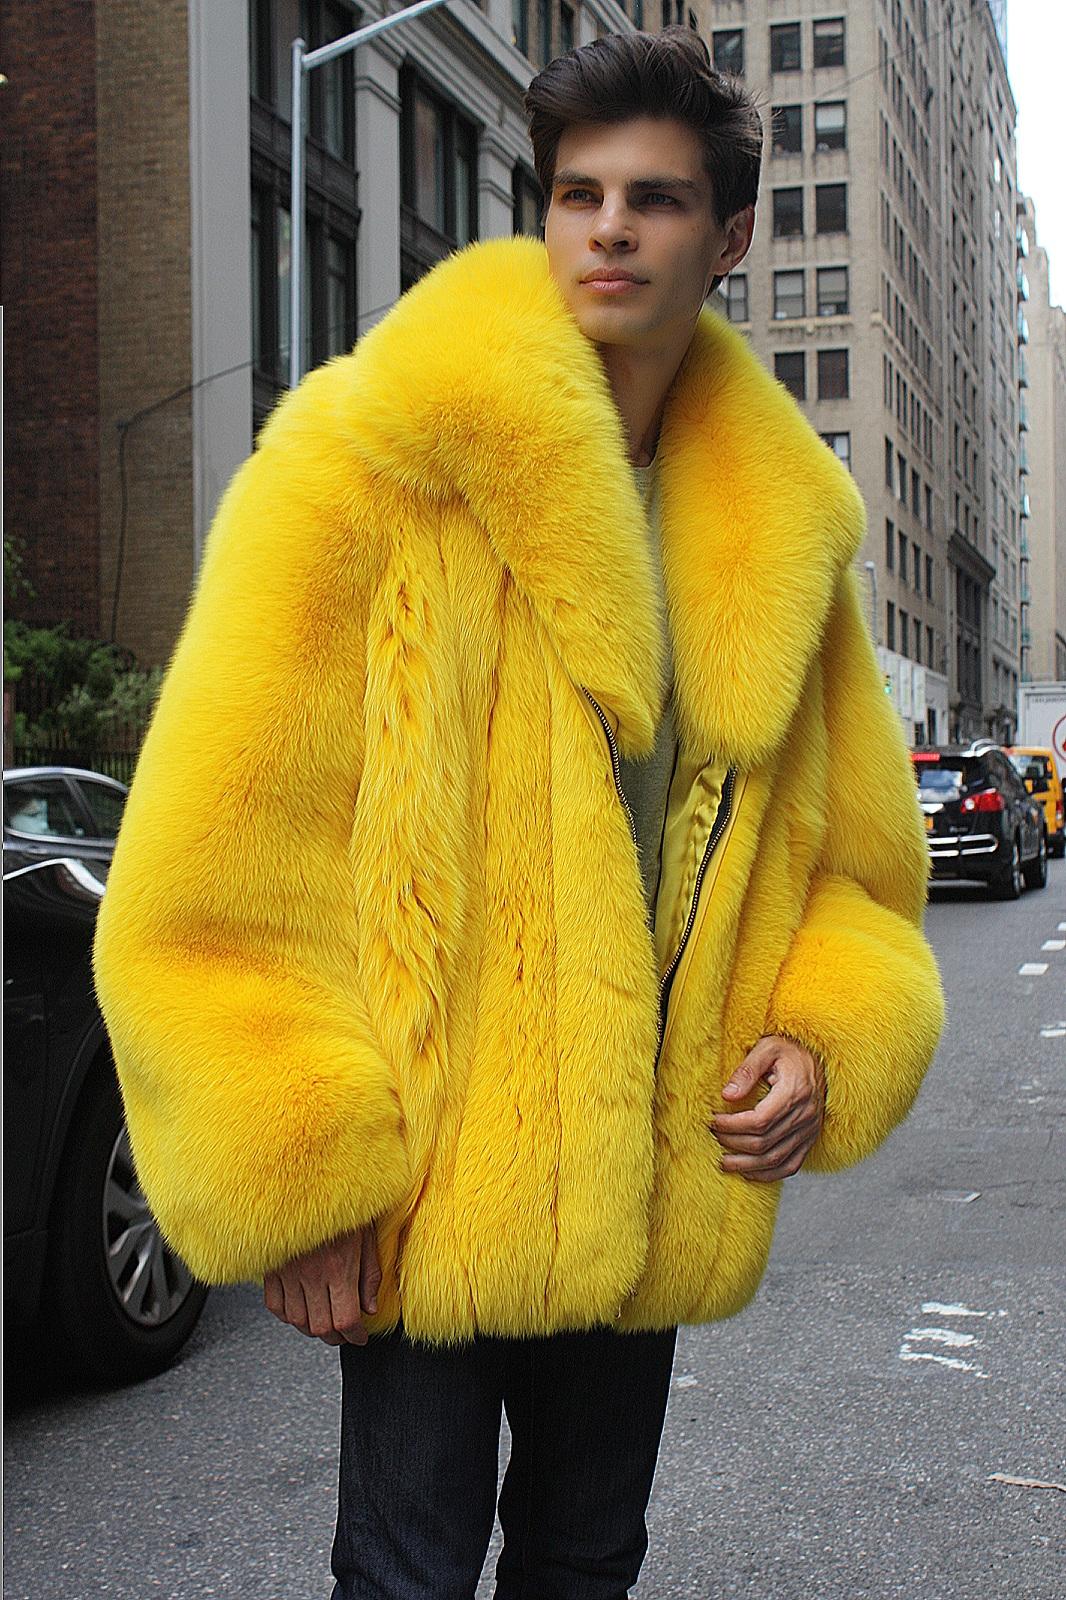 men's fur coat